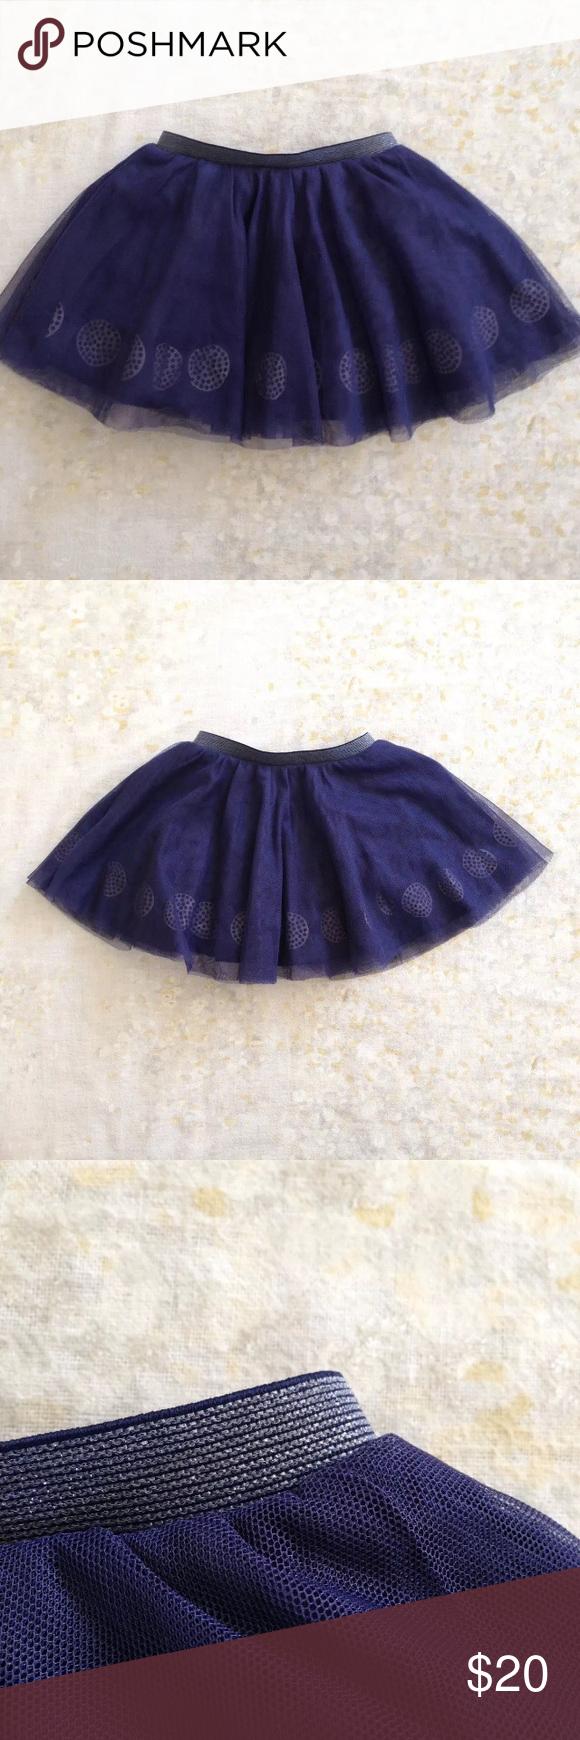 Obaibi Navy Blue Tutu Skirt Circles 6 Mos 68 cm Obaibi, a